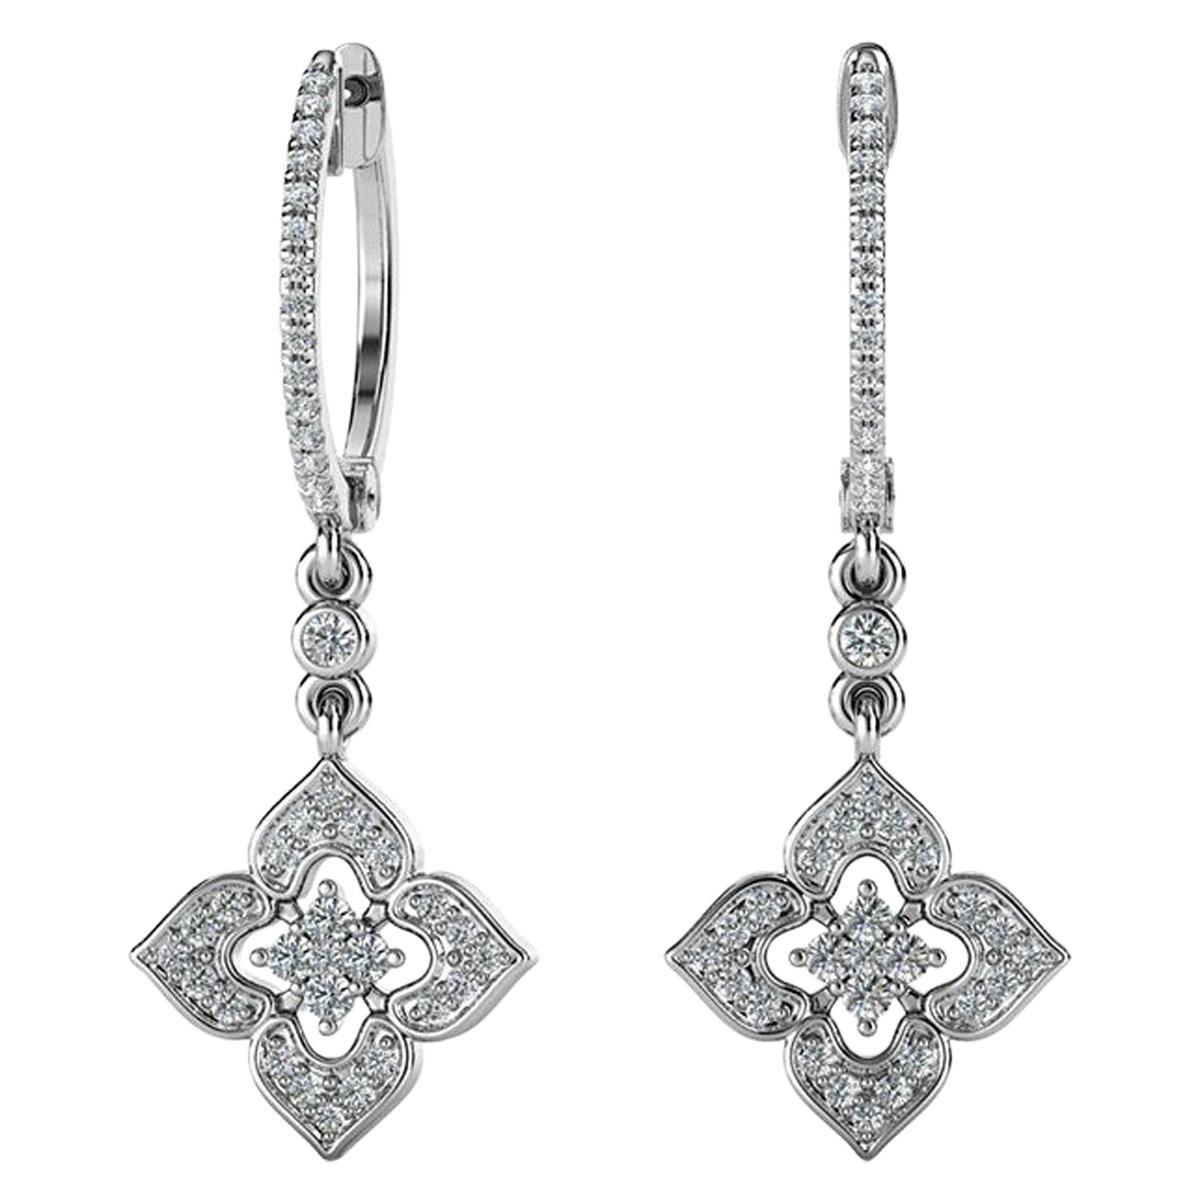 18 Karat White Gold Dangling Halo Diamond Earrings '2/5 Carat'